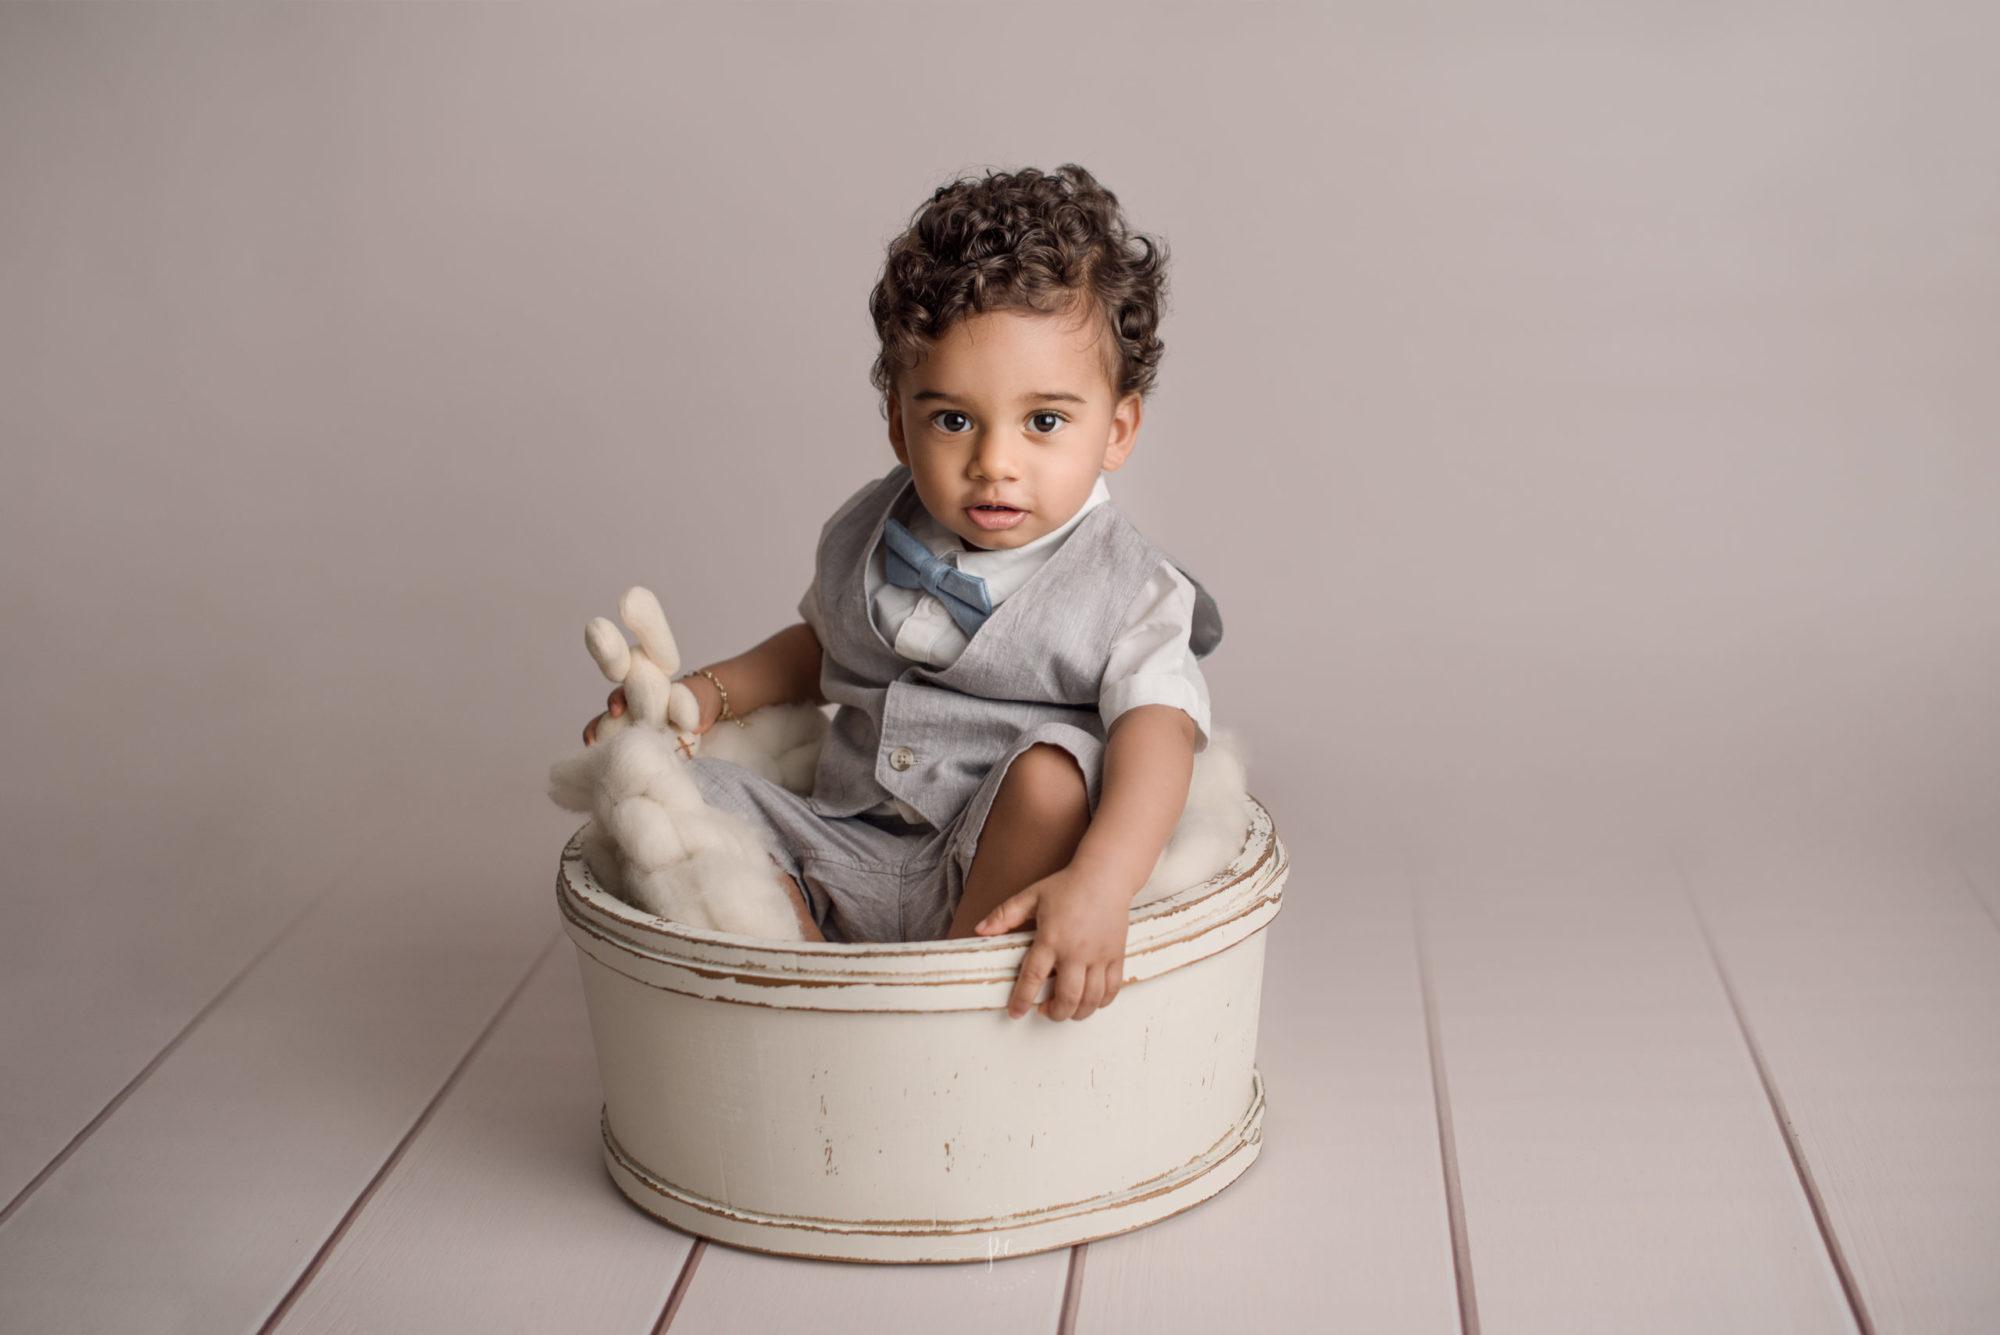 photo bébé angers profesionnel igor scaled e1610097953631